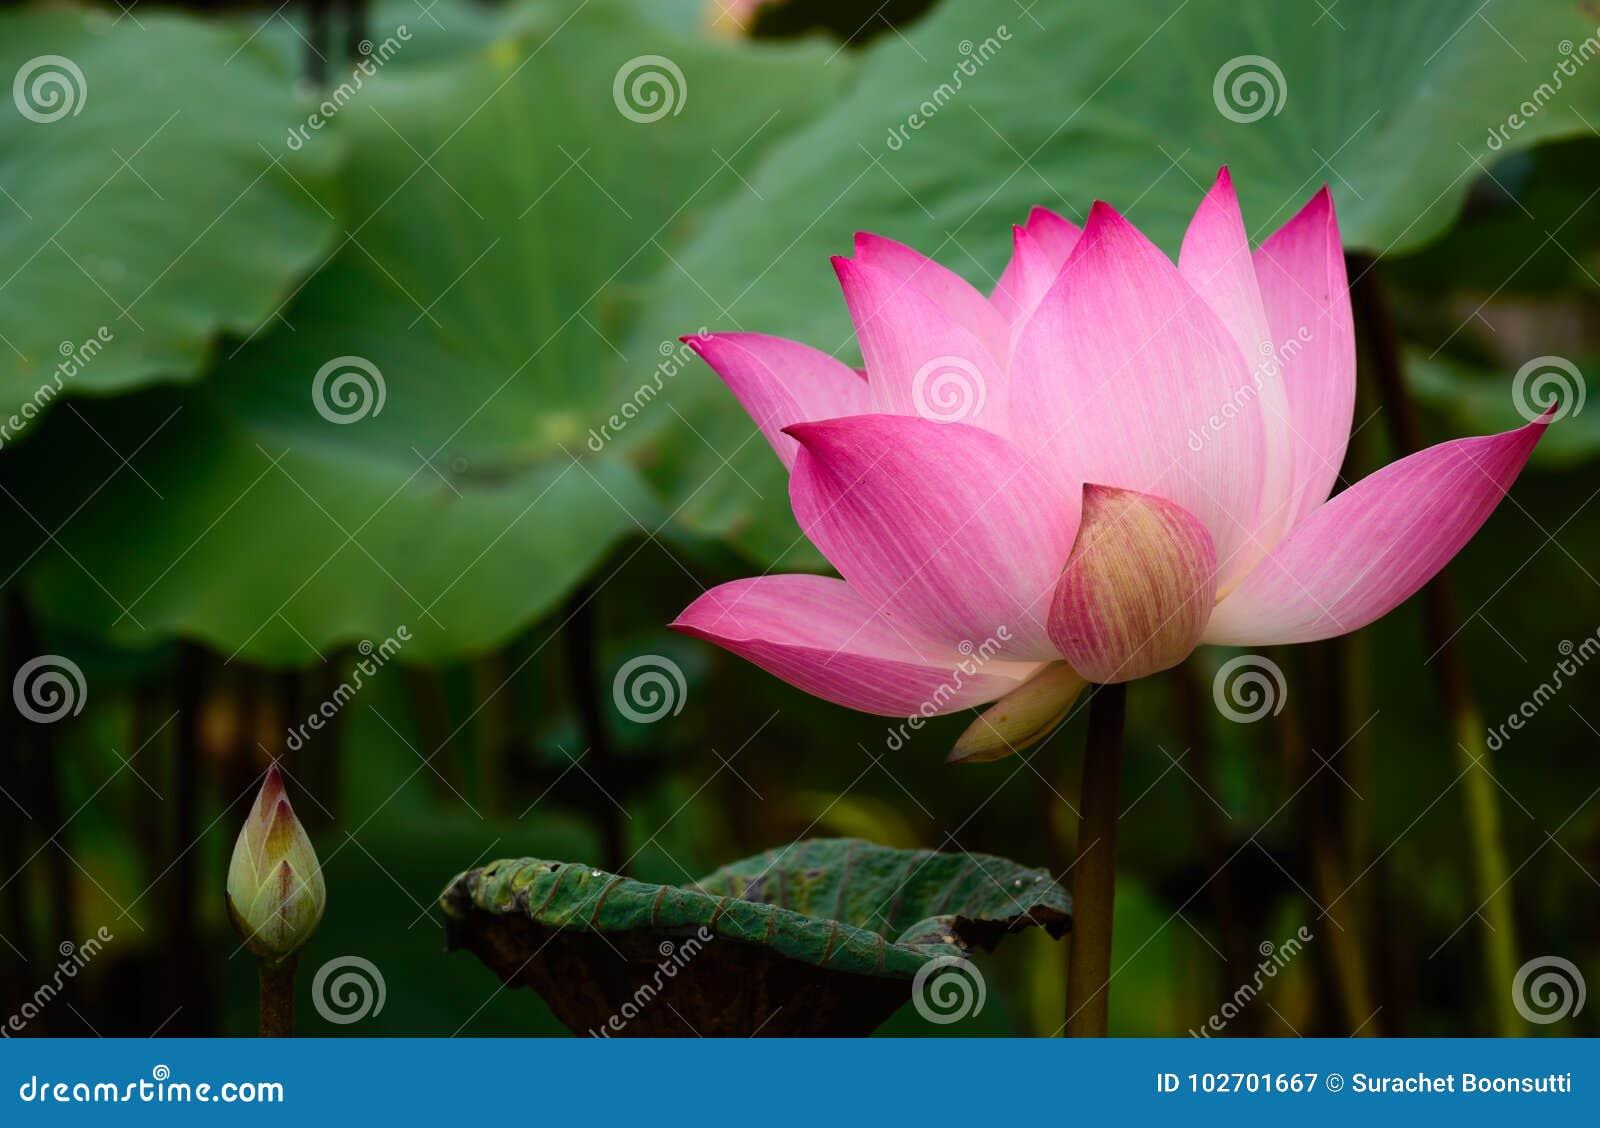 Water Lily Beautiful Lotus Flower Stock Image Image Of Fern Petal